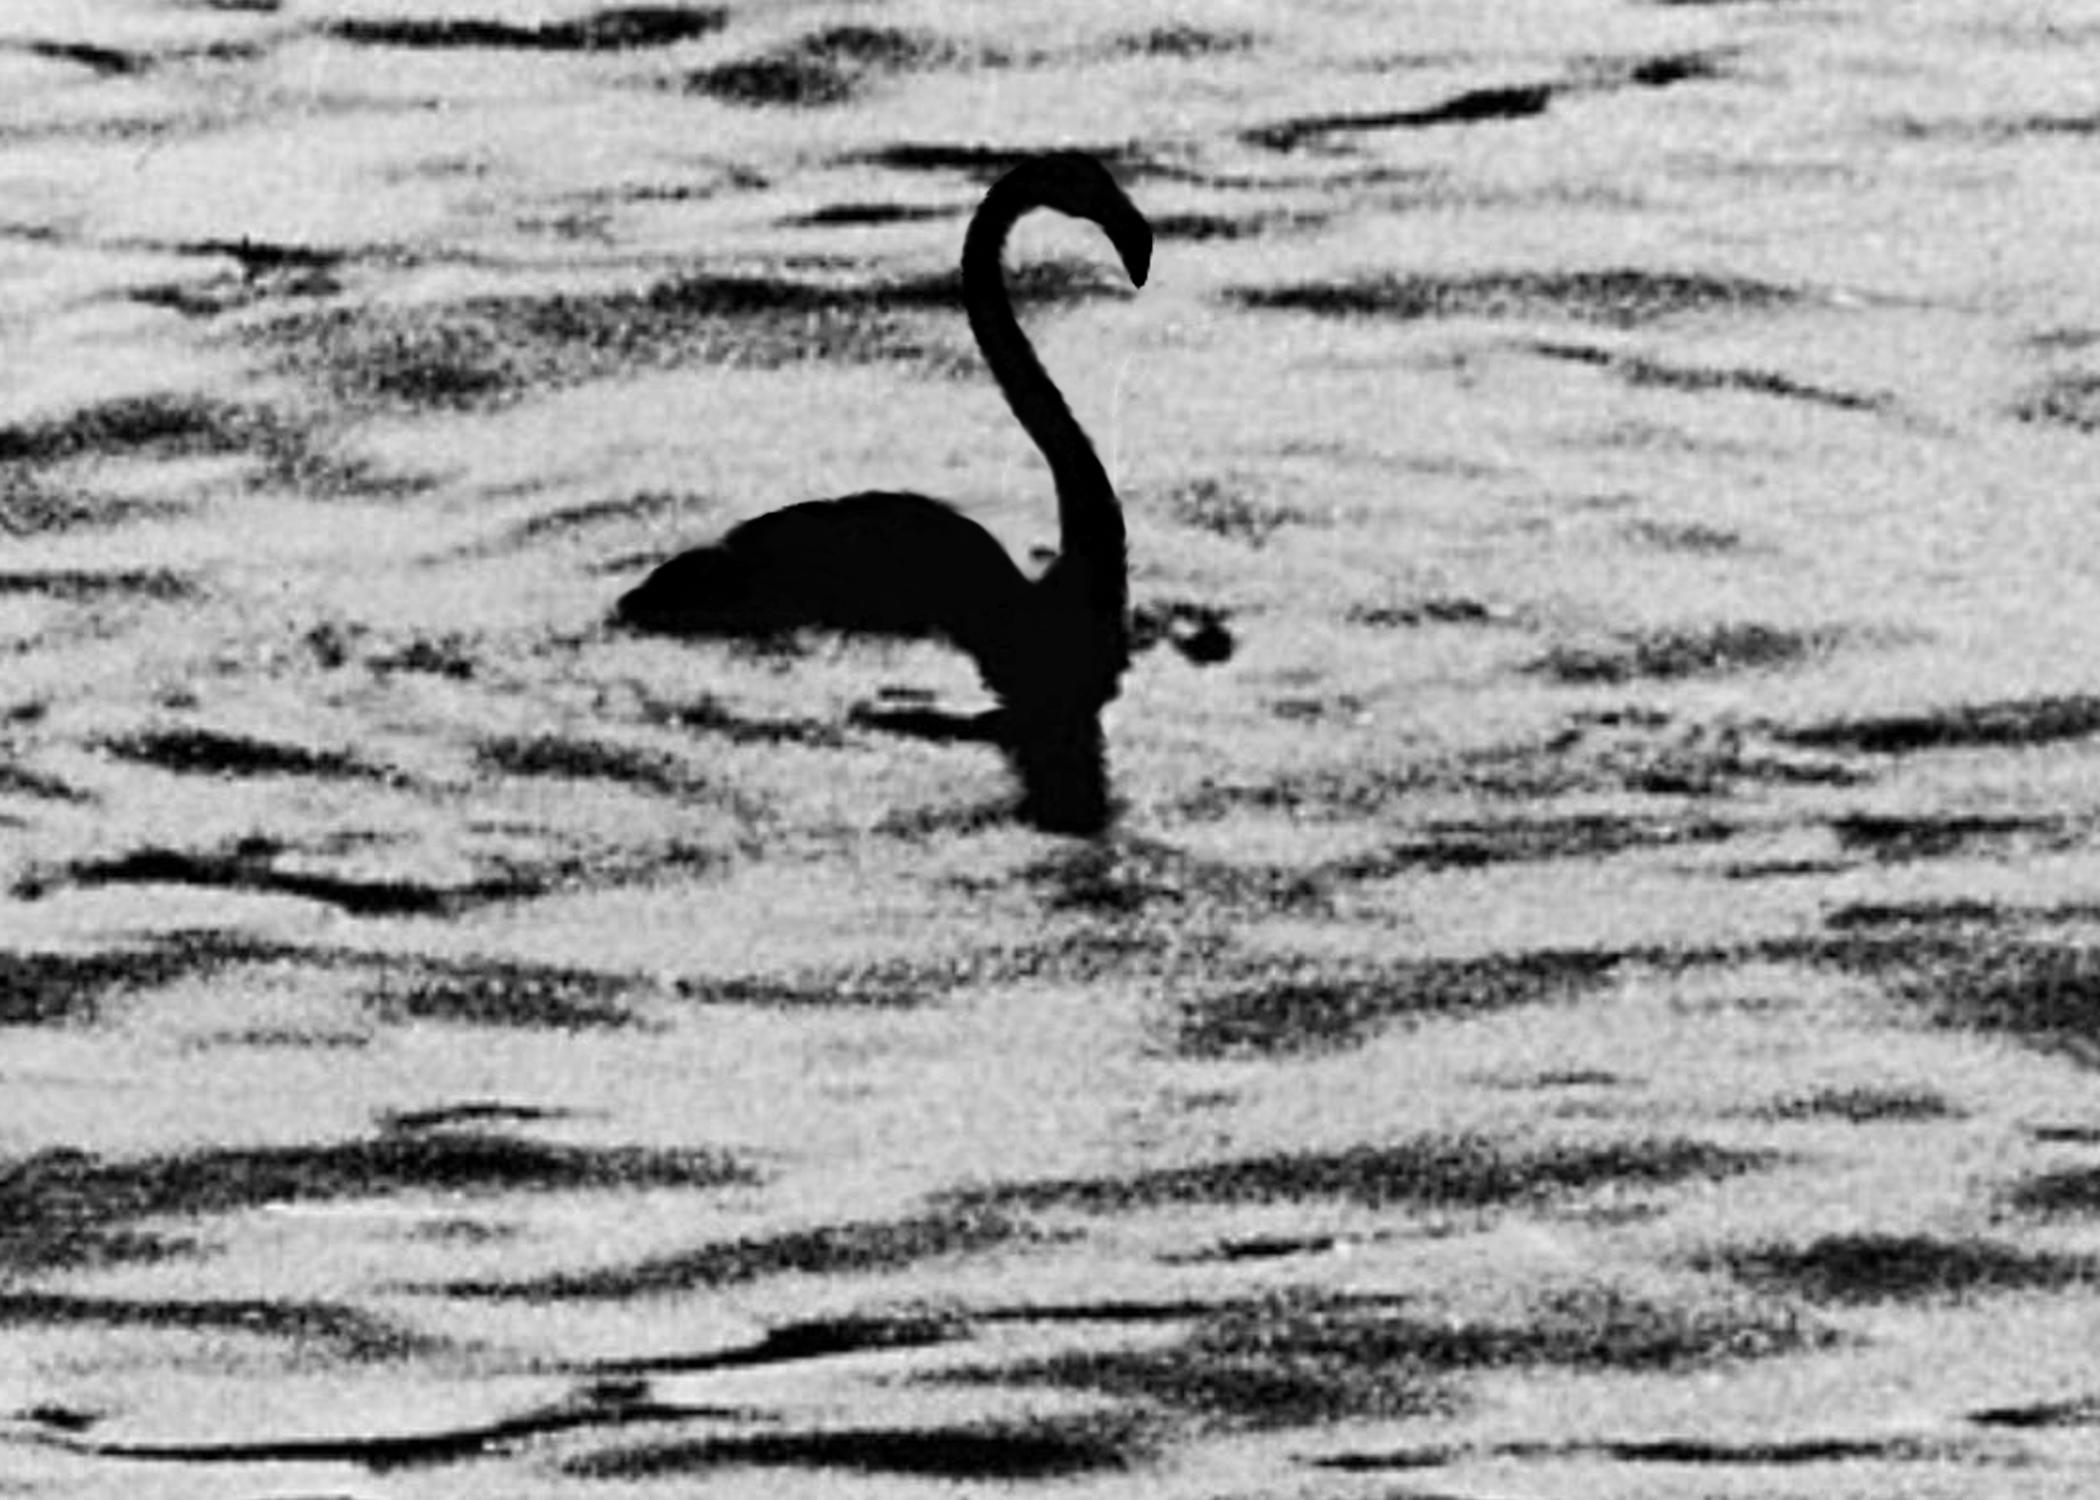 McDade_flamingo2.jpg